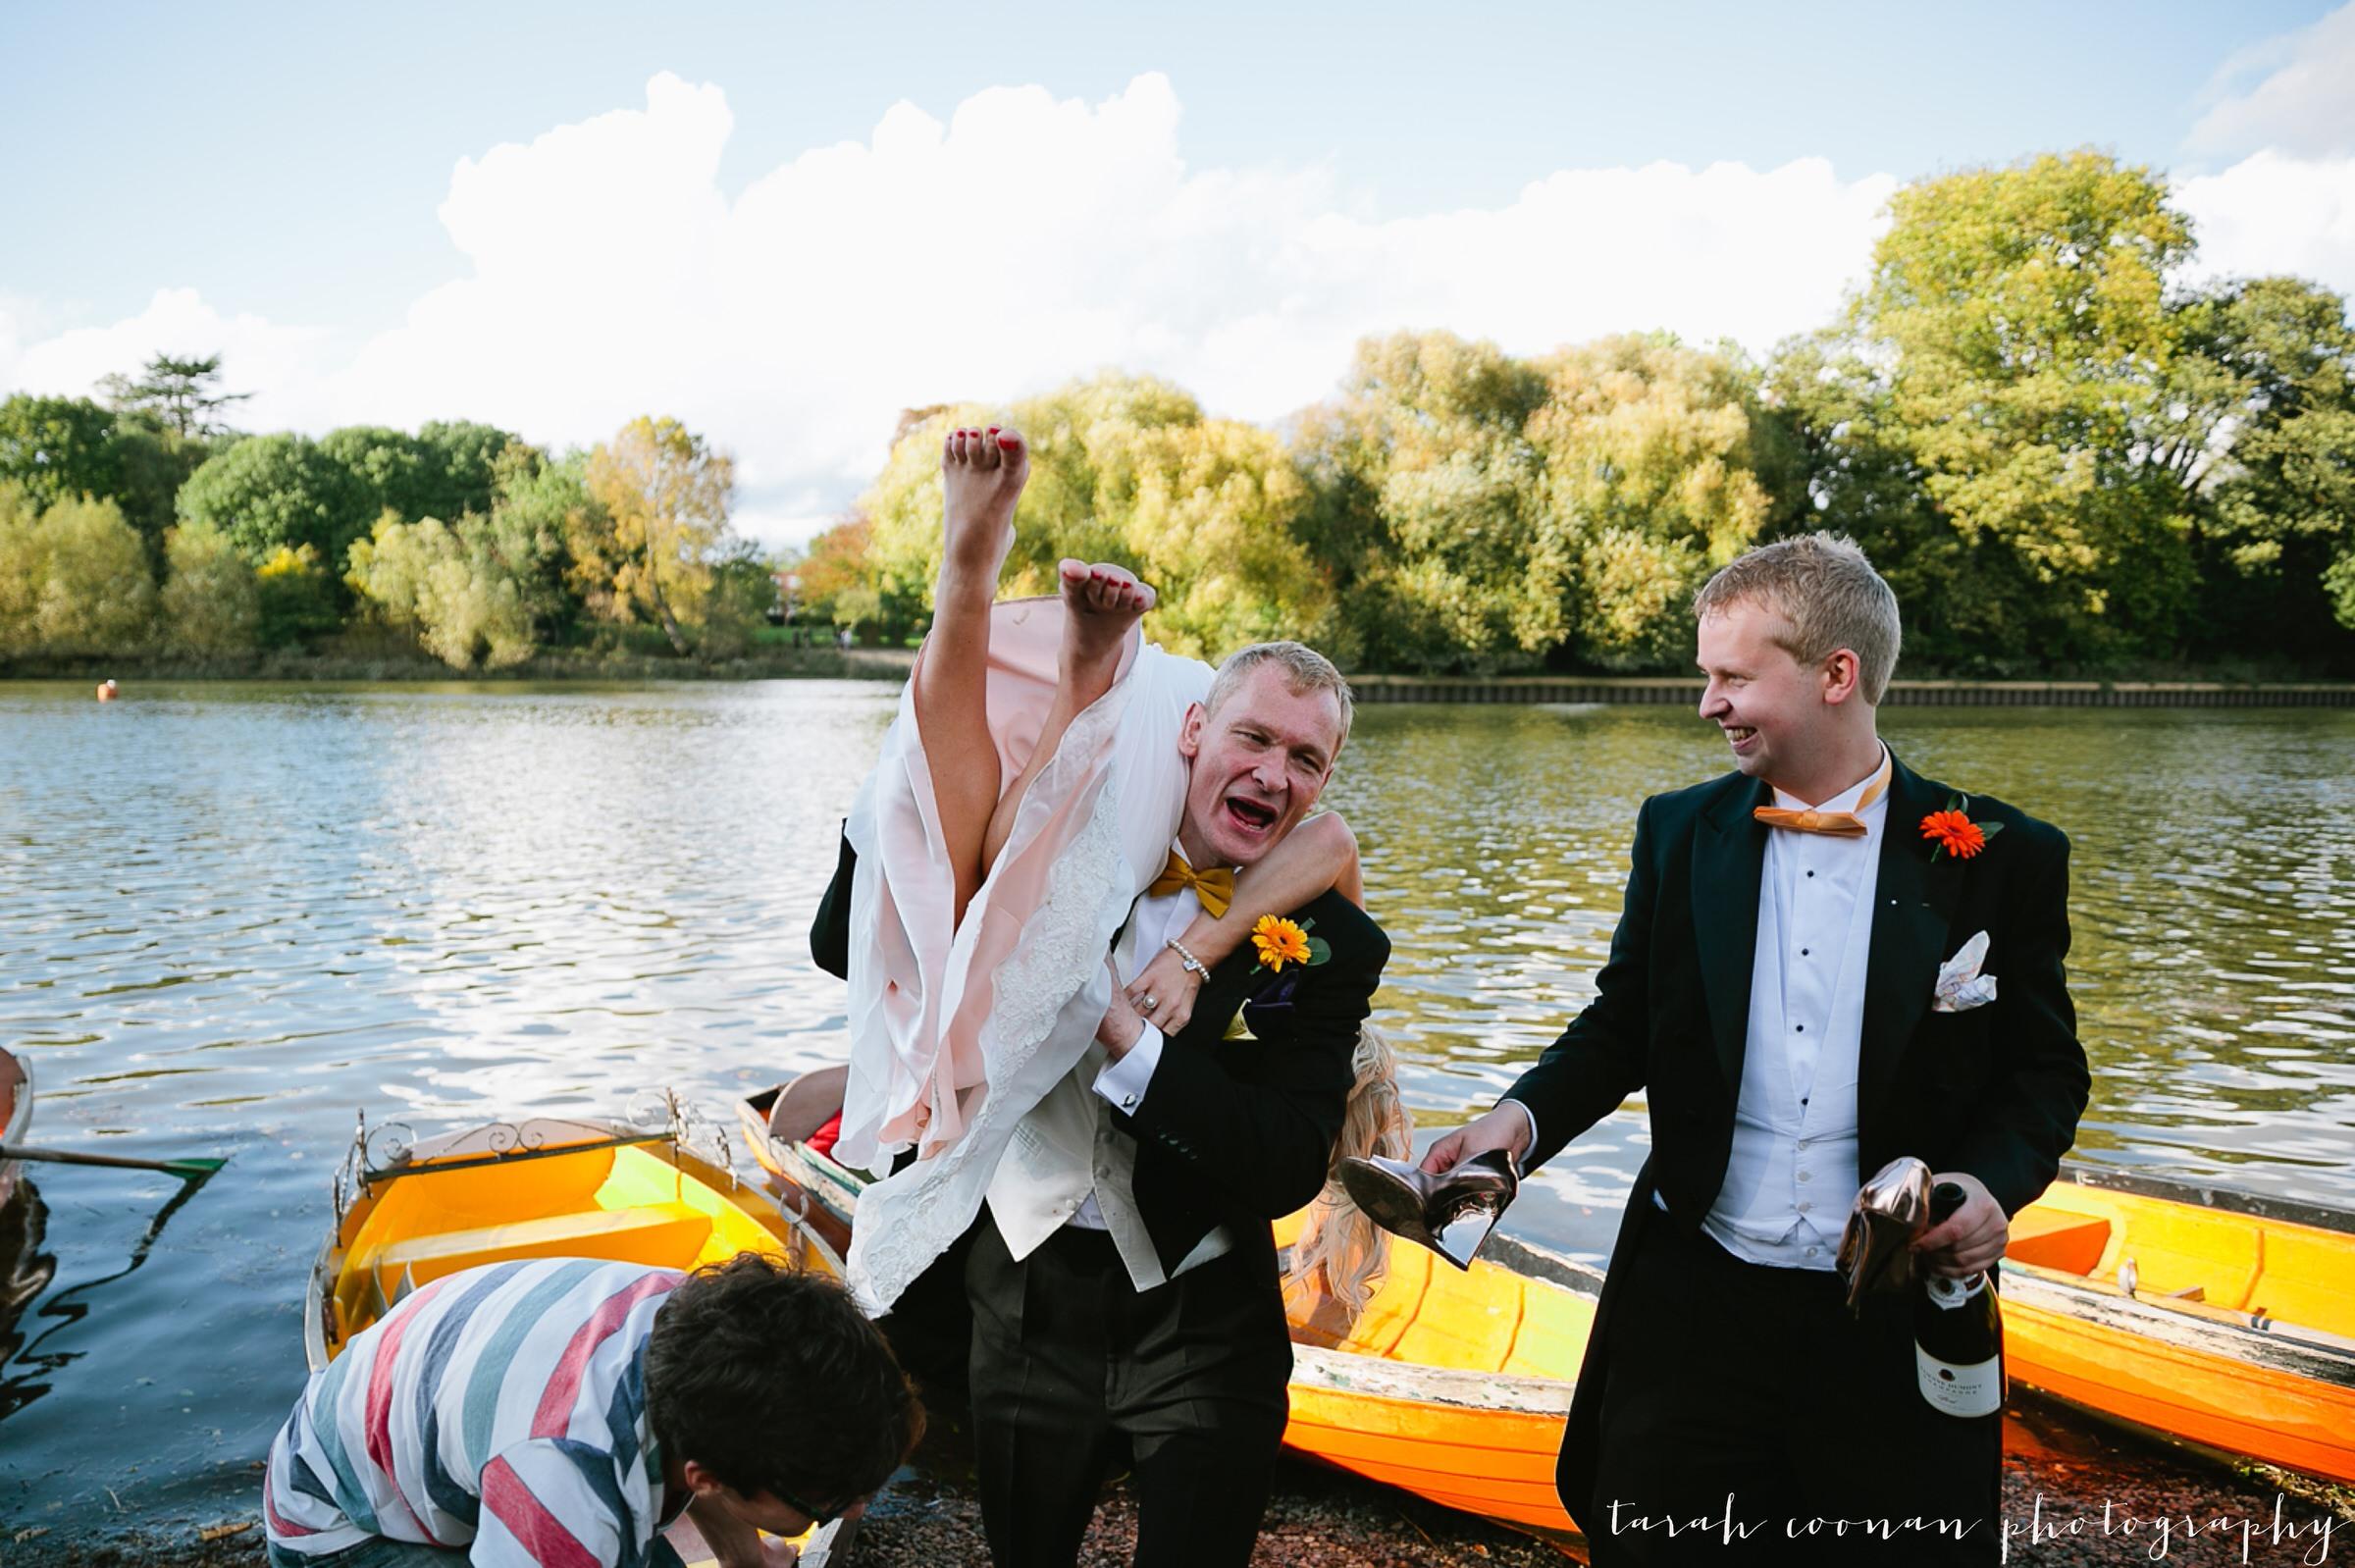 brighton-wedding-photographer43